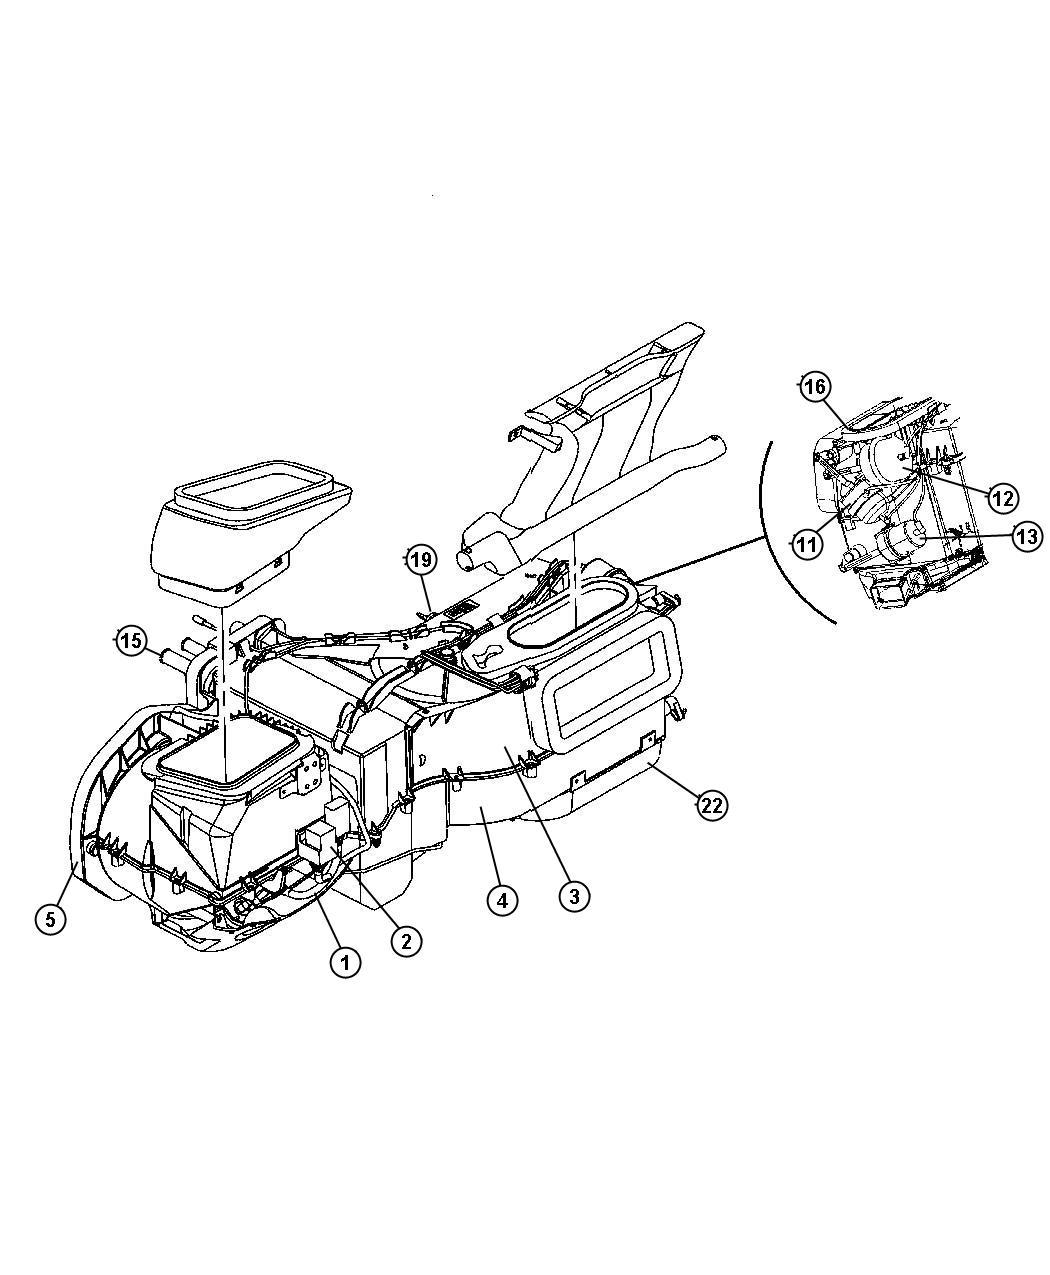 Jeep Wrangler Actuator  Egr Vacuum  Vacuum  Blend Door